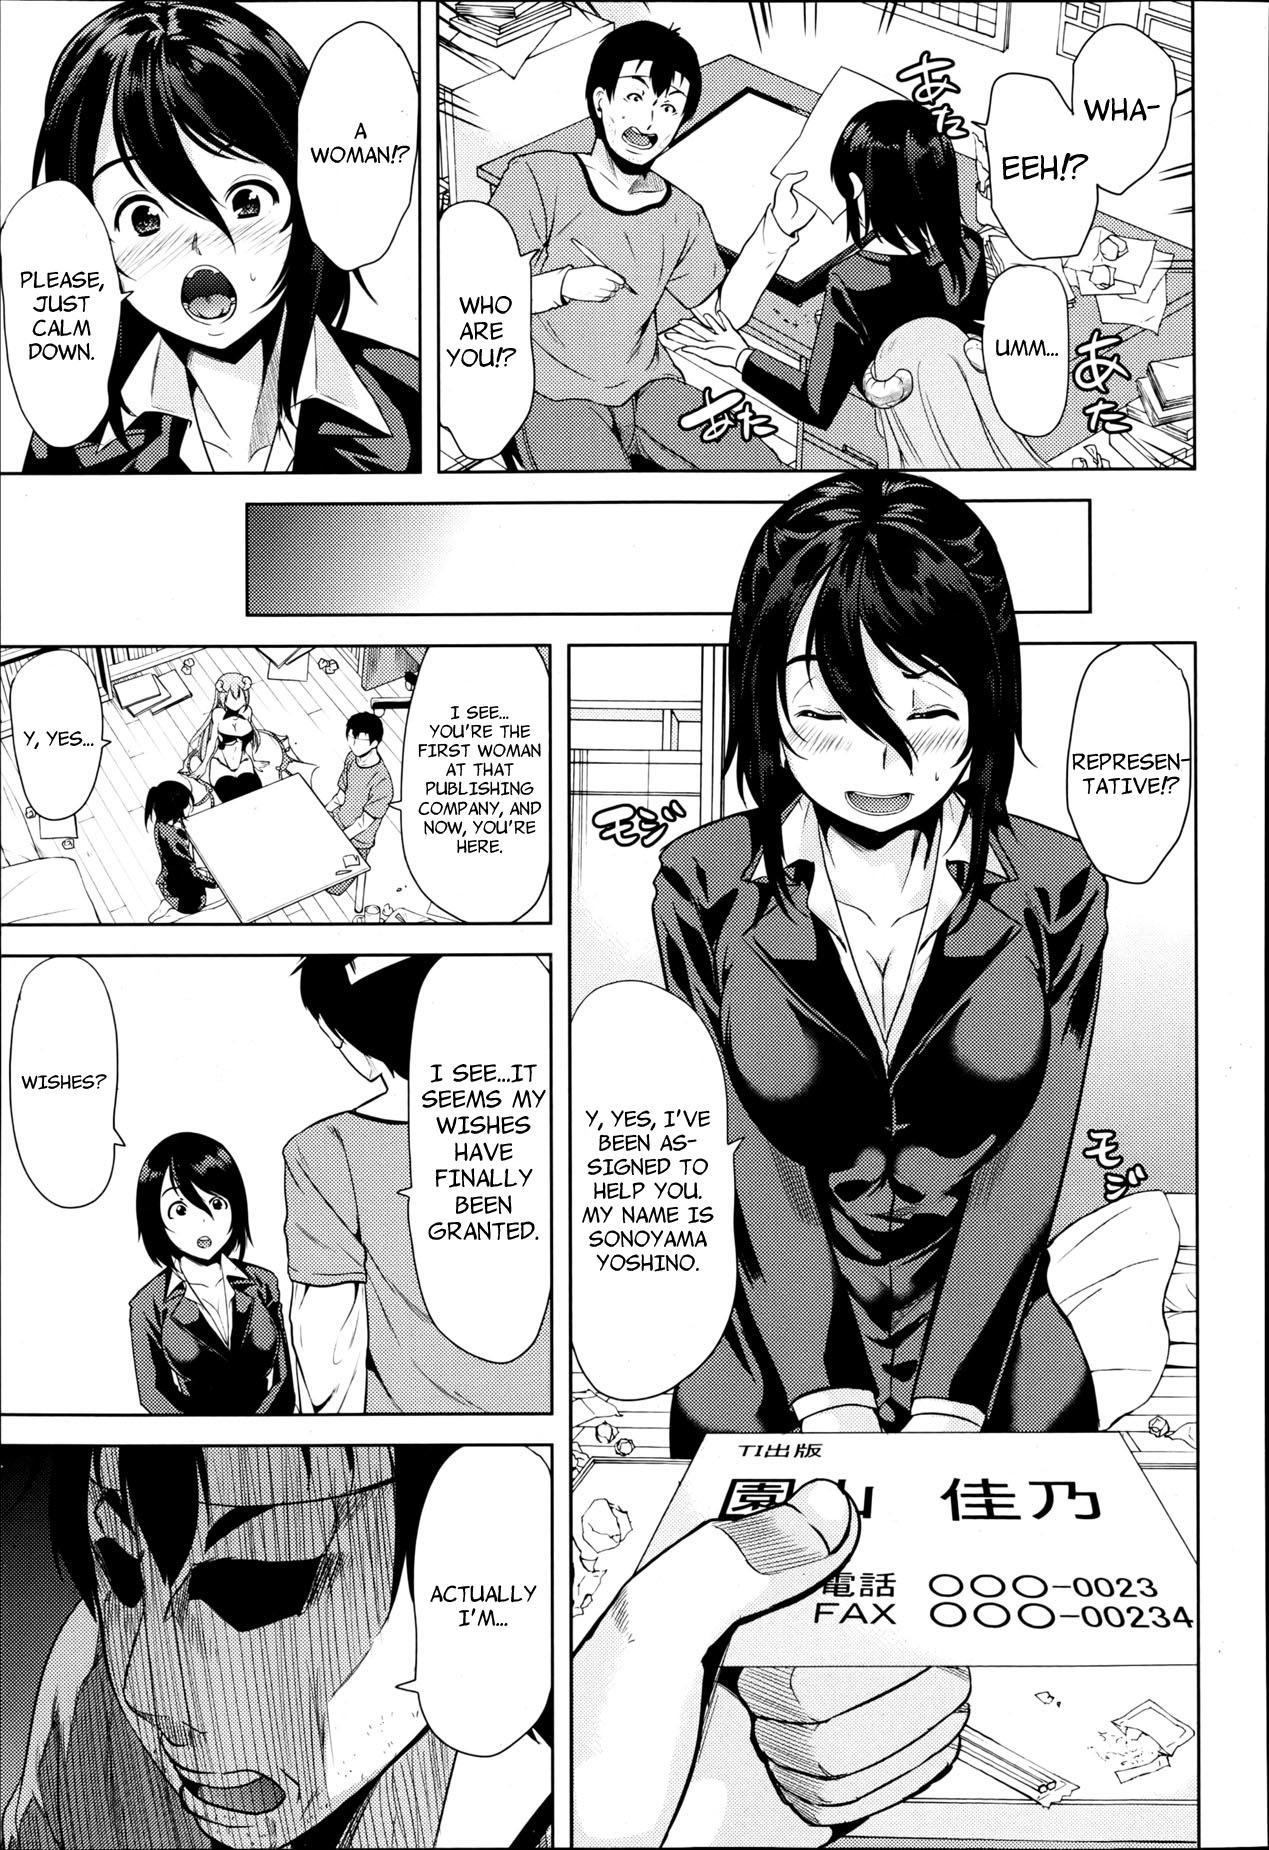 H na Manko no Tsukurikata 17